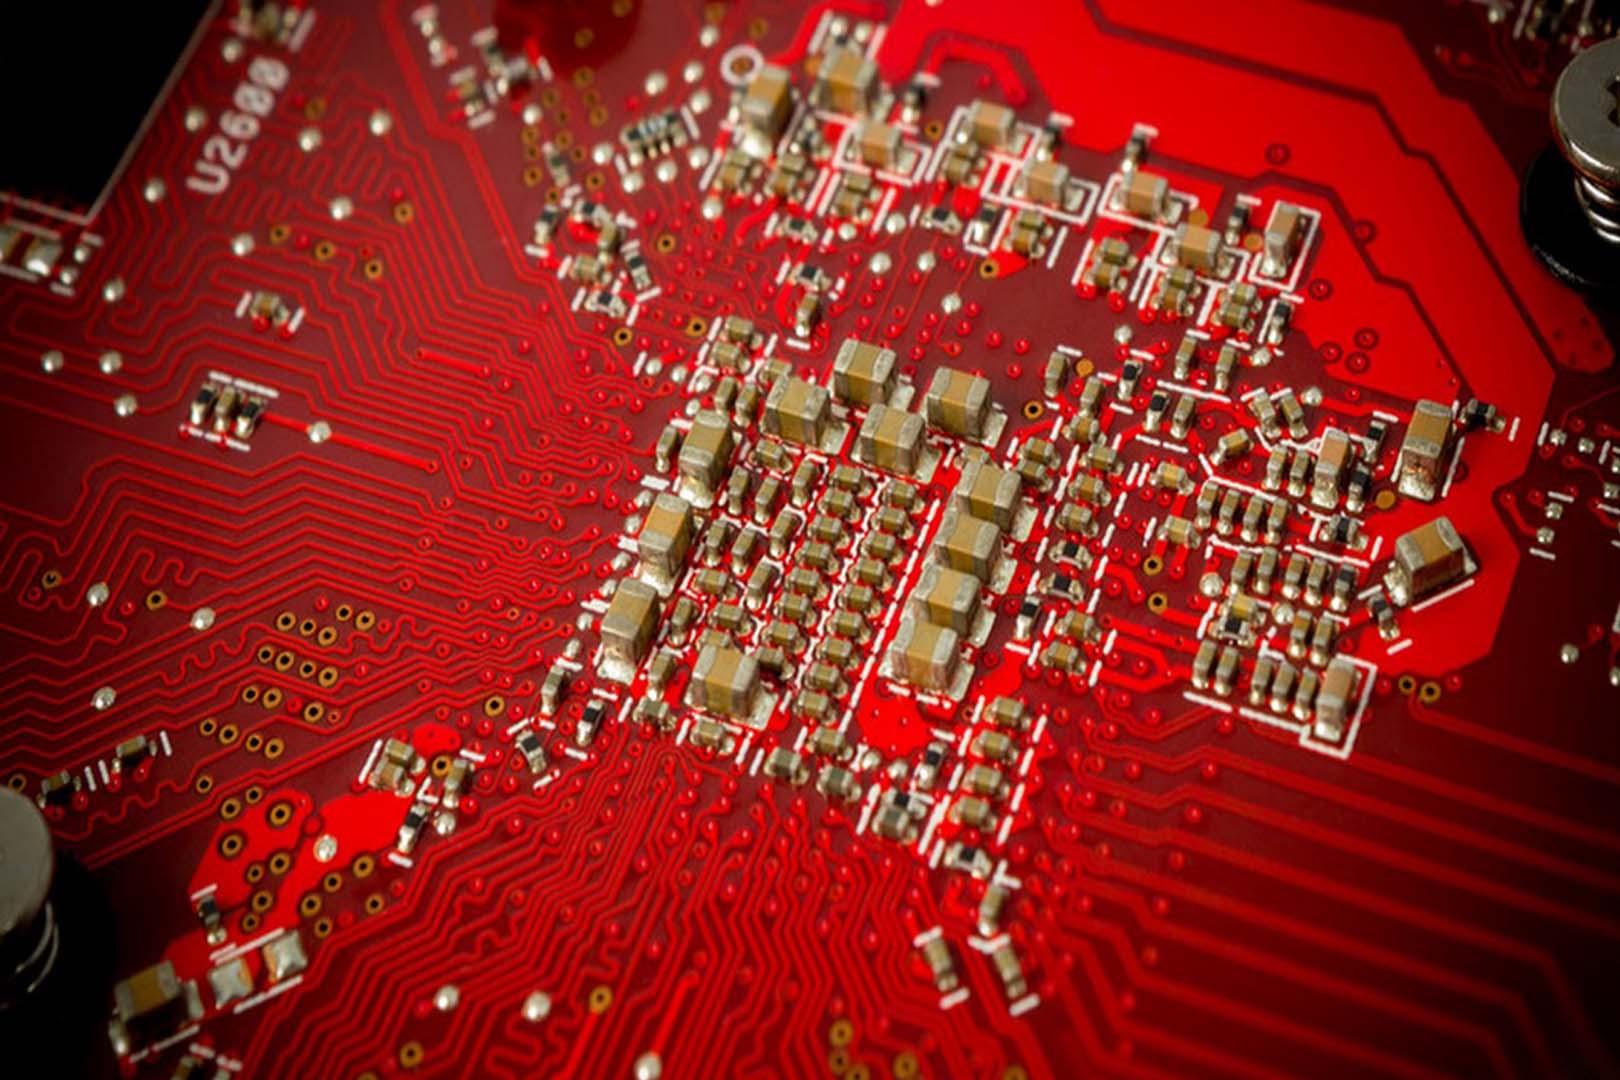 Elettrico ed elettronico